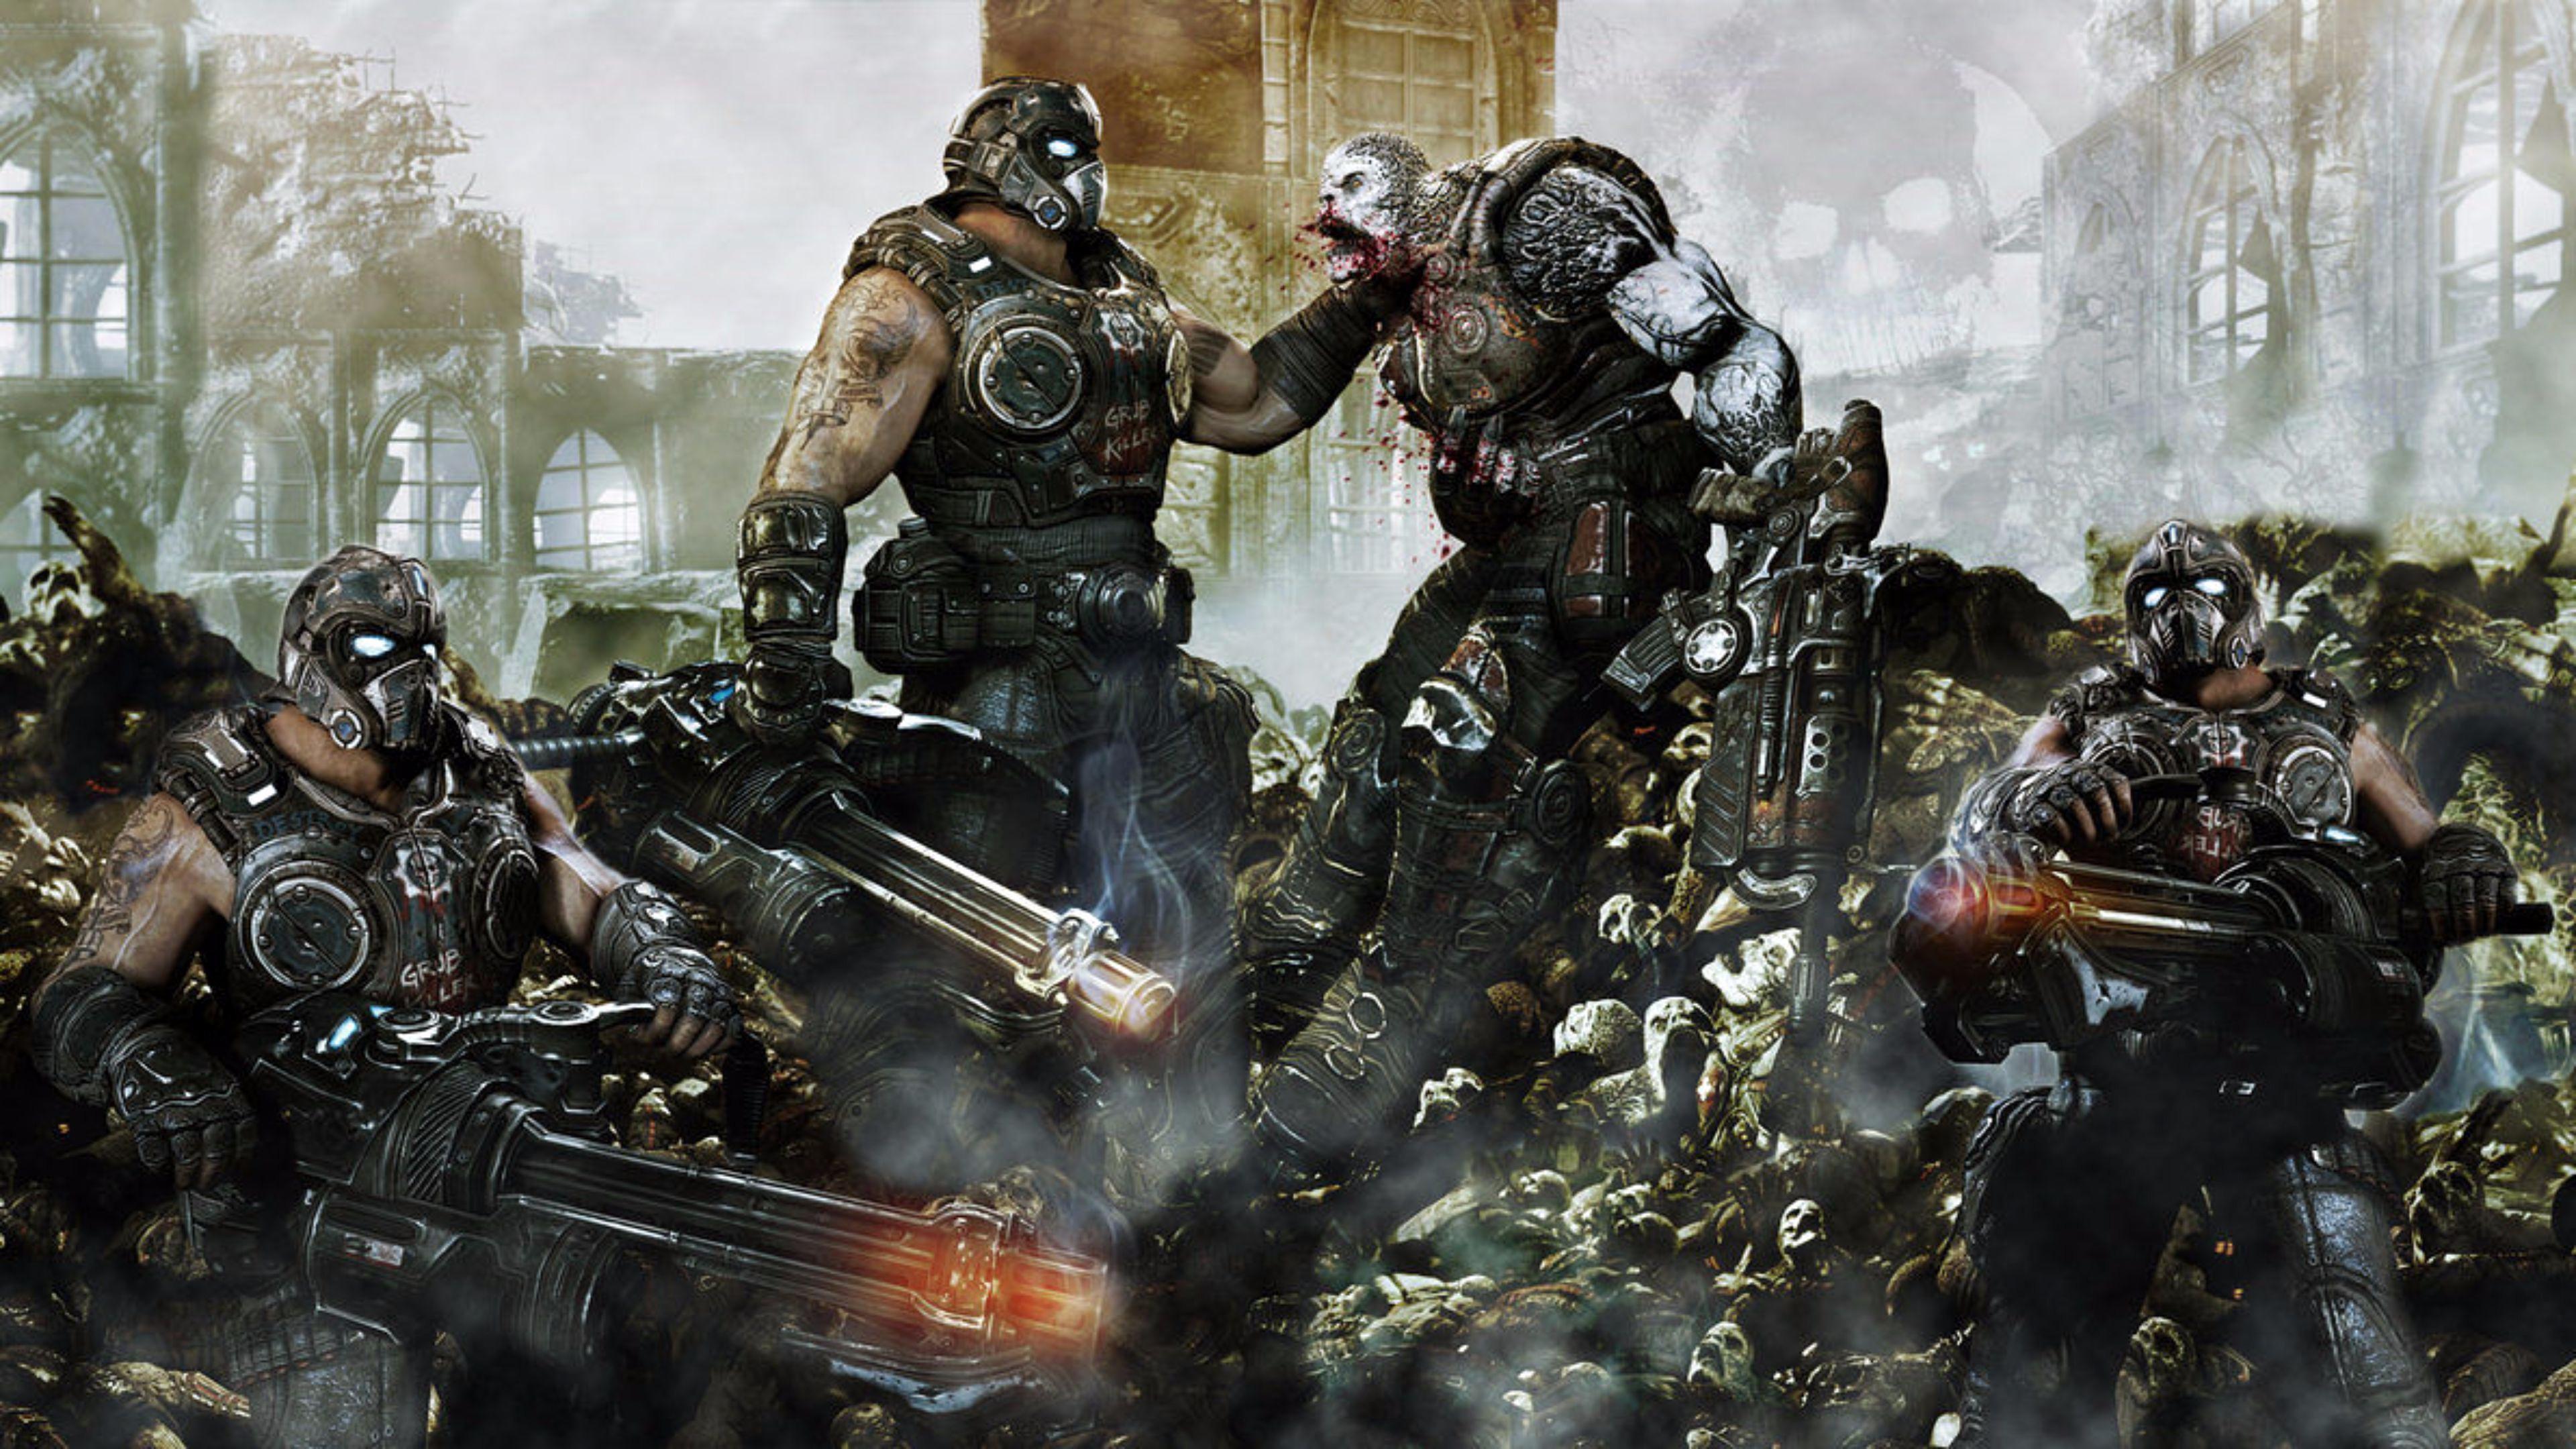 Gears Of War Hd Wallpaper Posted By John Johnson